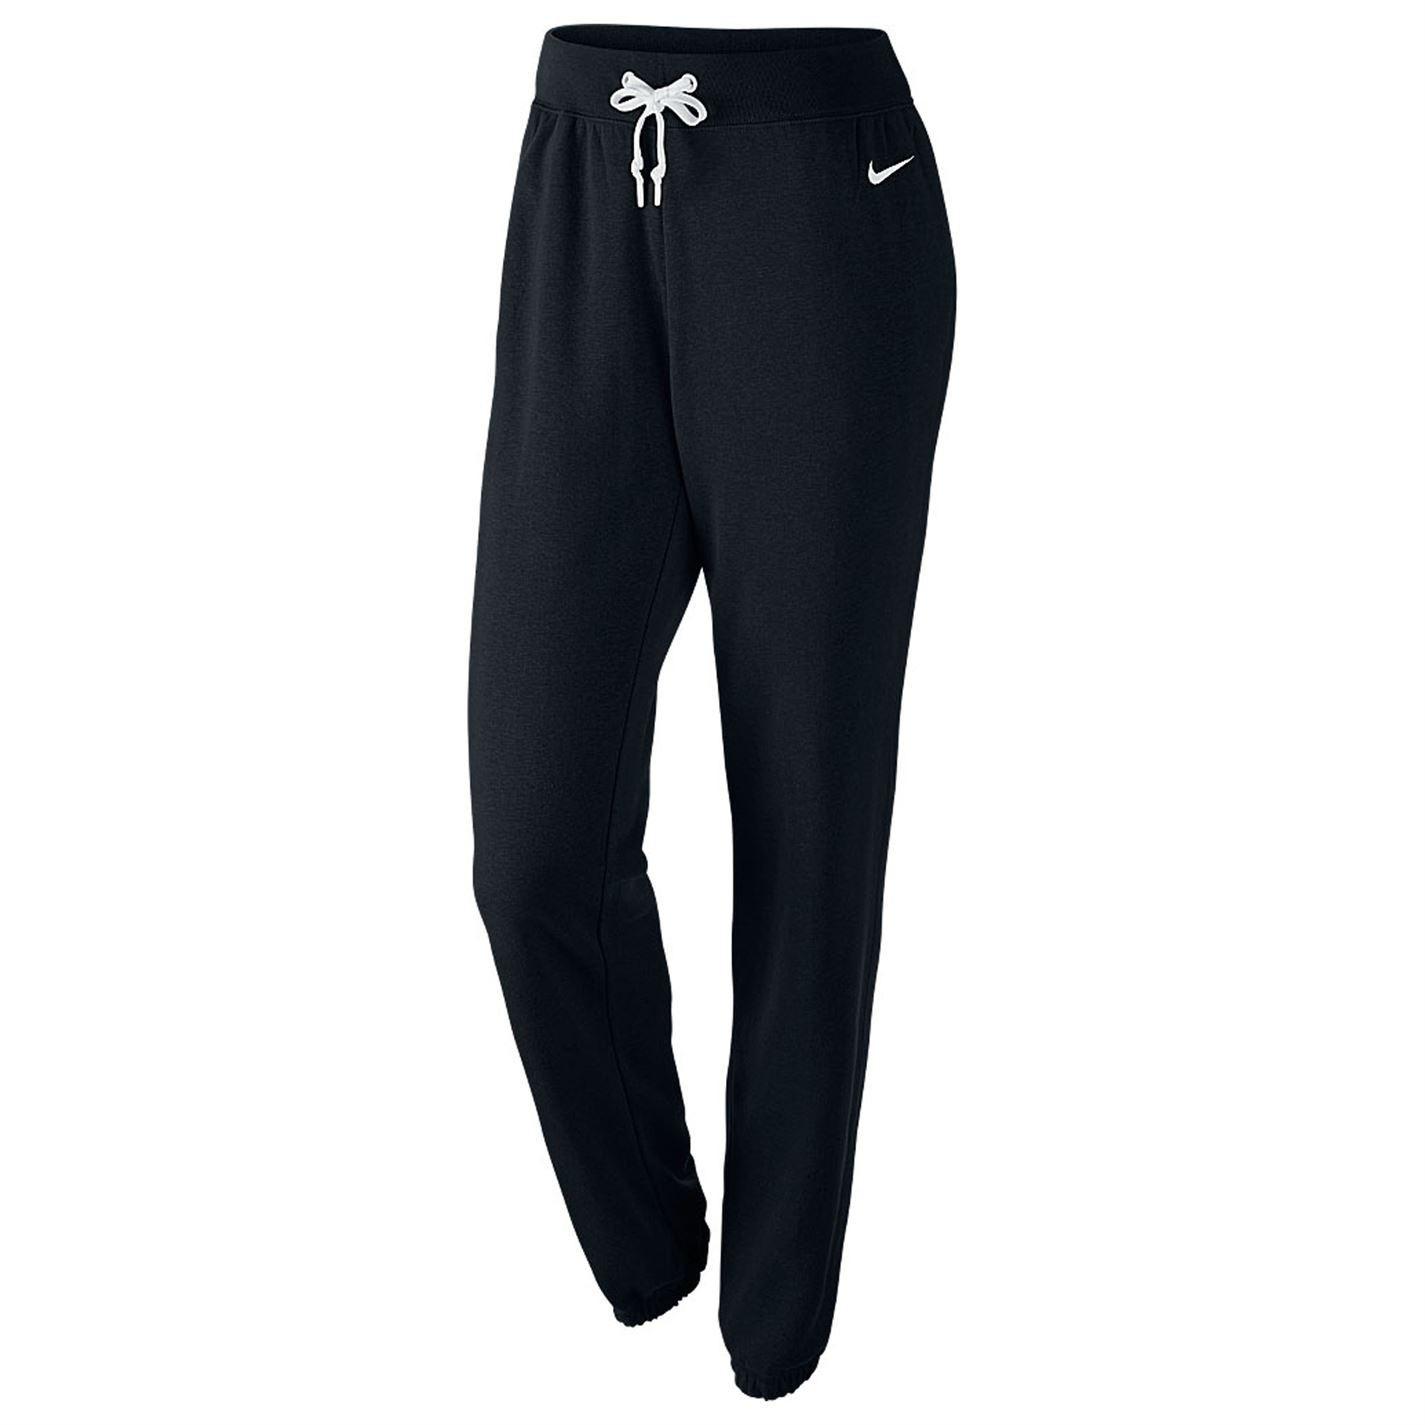 nike loose jersey sweat pants womens black track bottoms